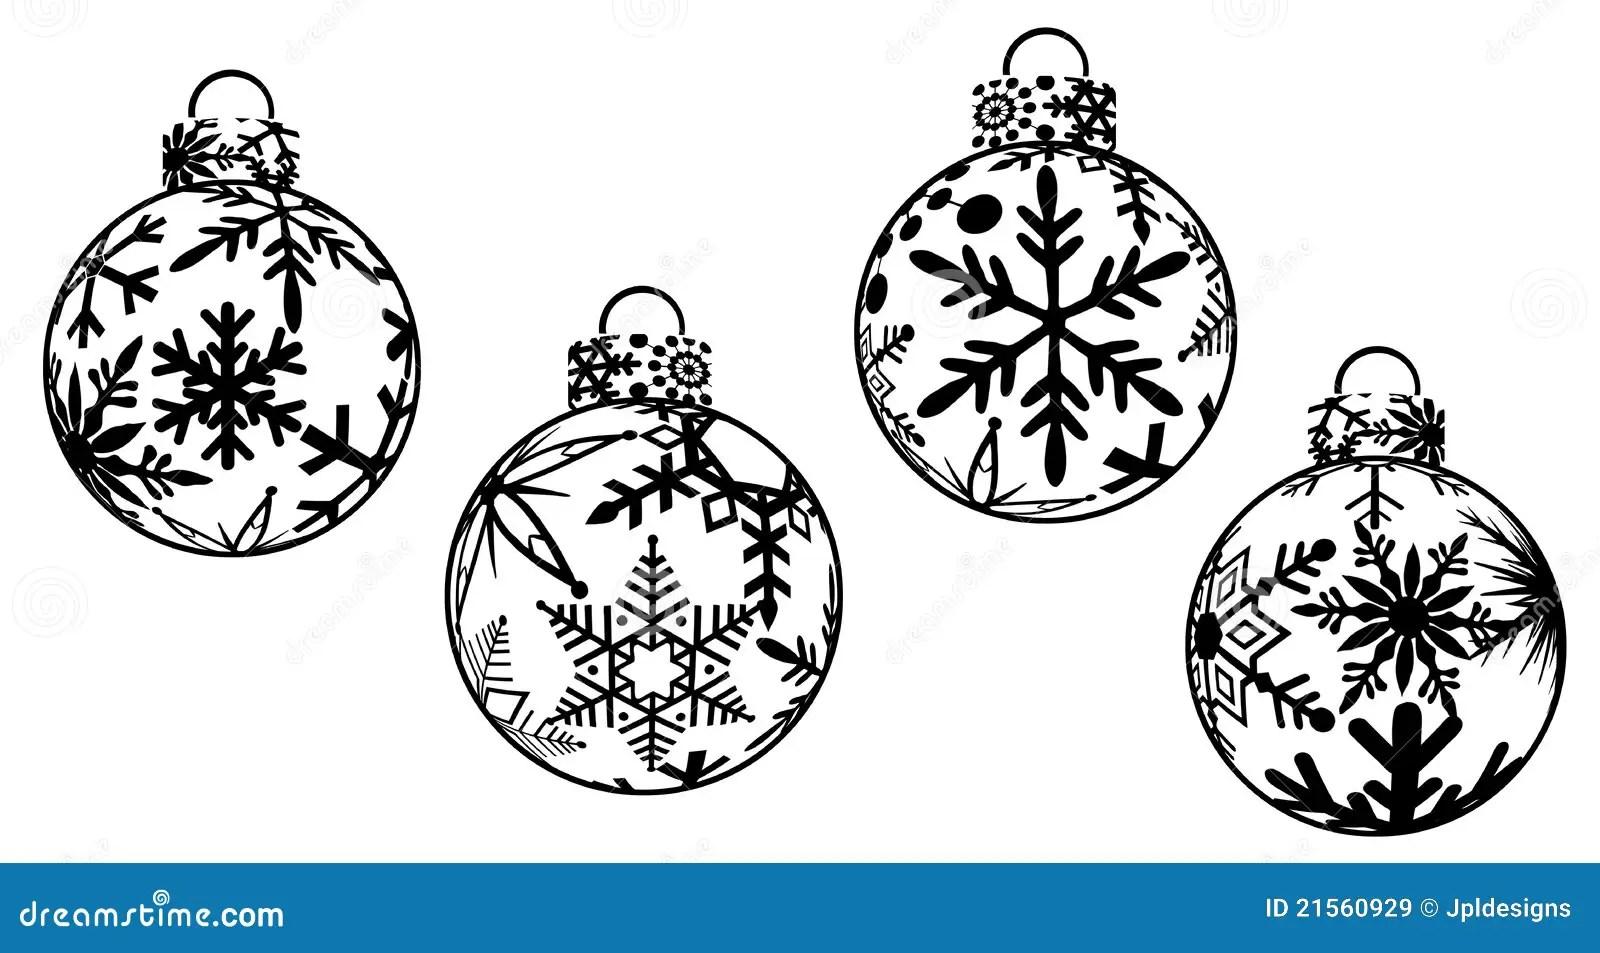 Christmas Ornaments Clipart Stock Illustration